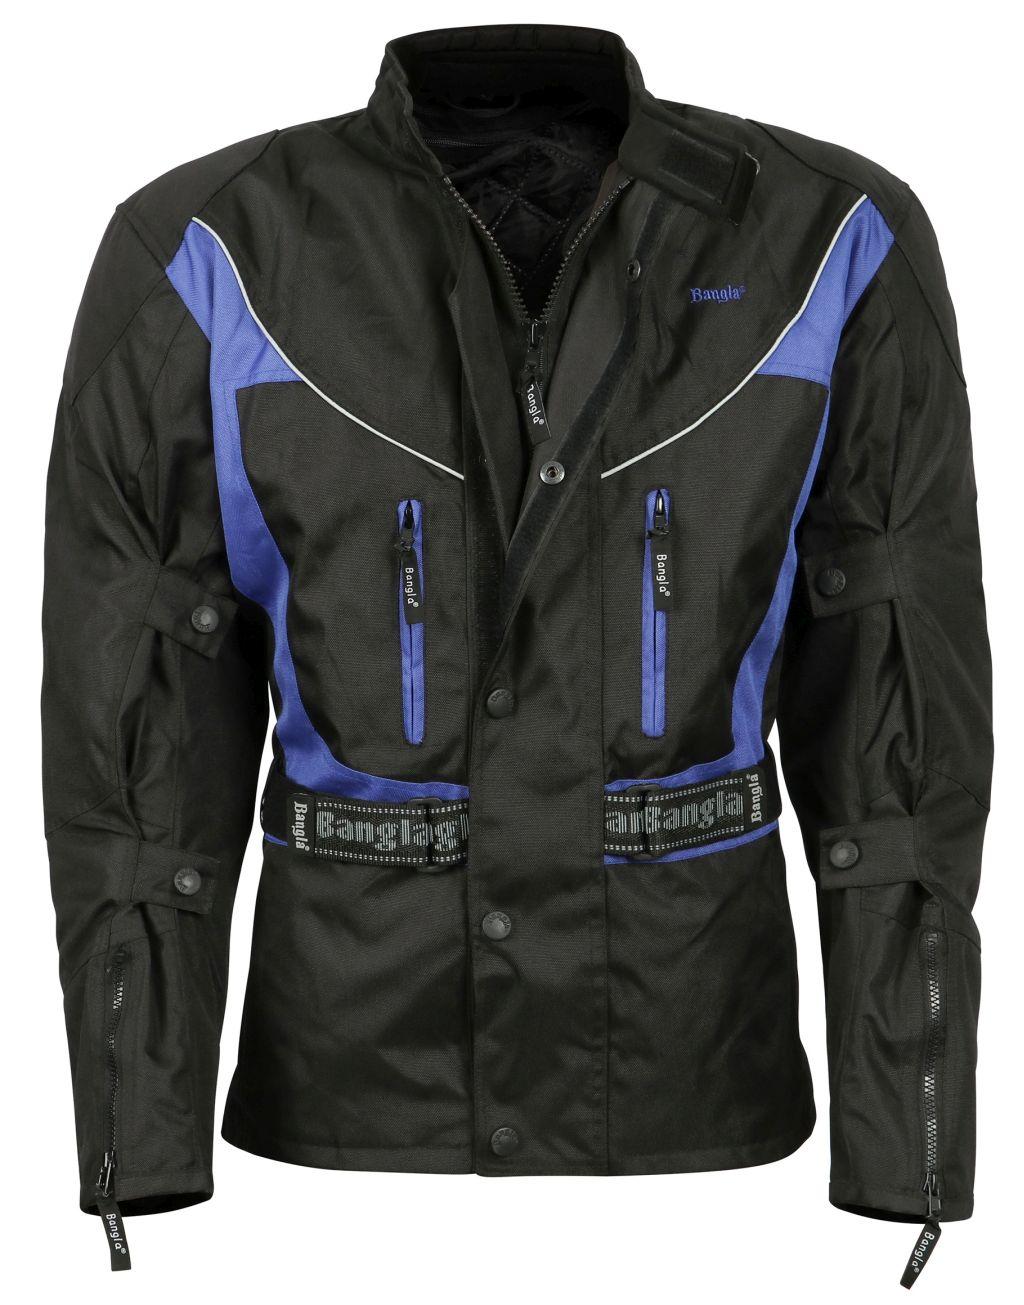 Bangla Motorrad Jacke Motorradjacke Textil Cordura Blau schwarz S - 8 XL